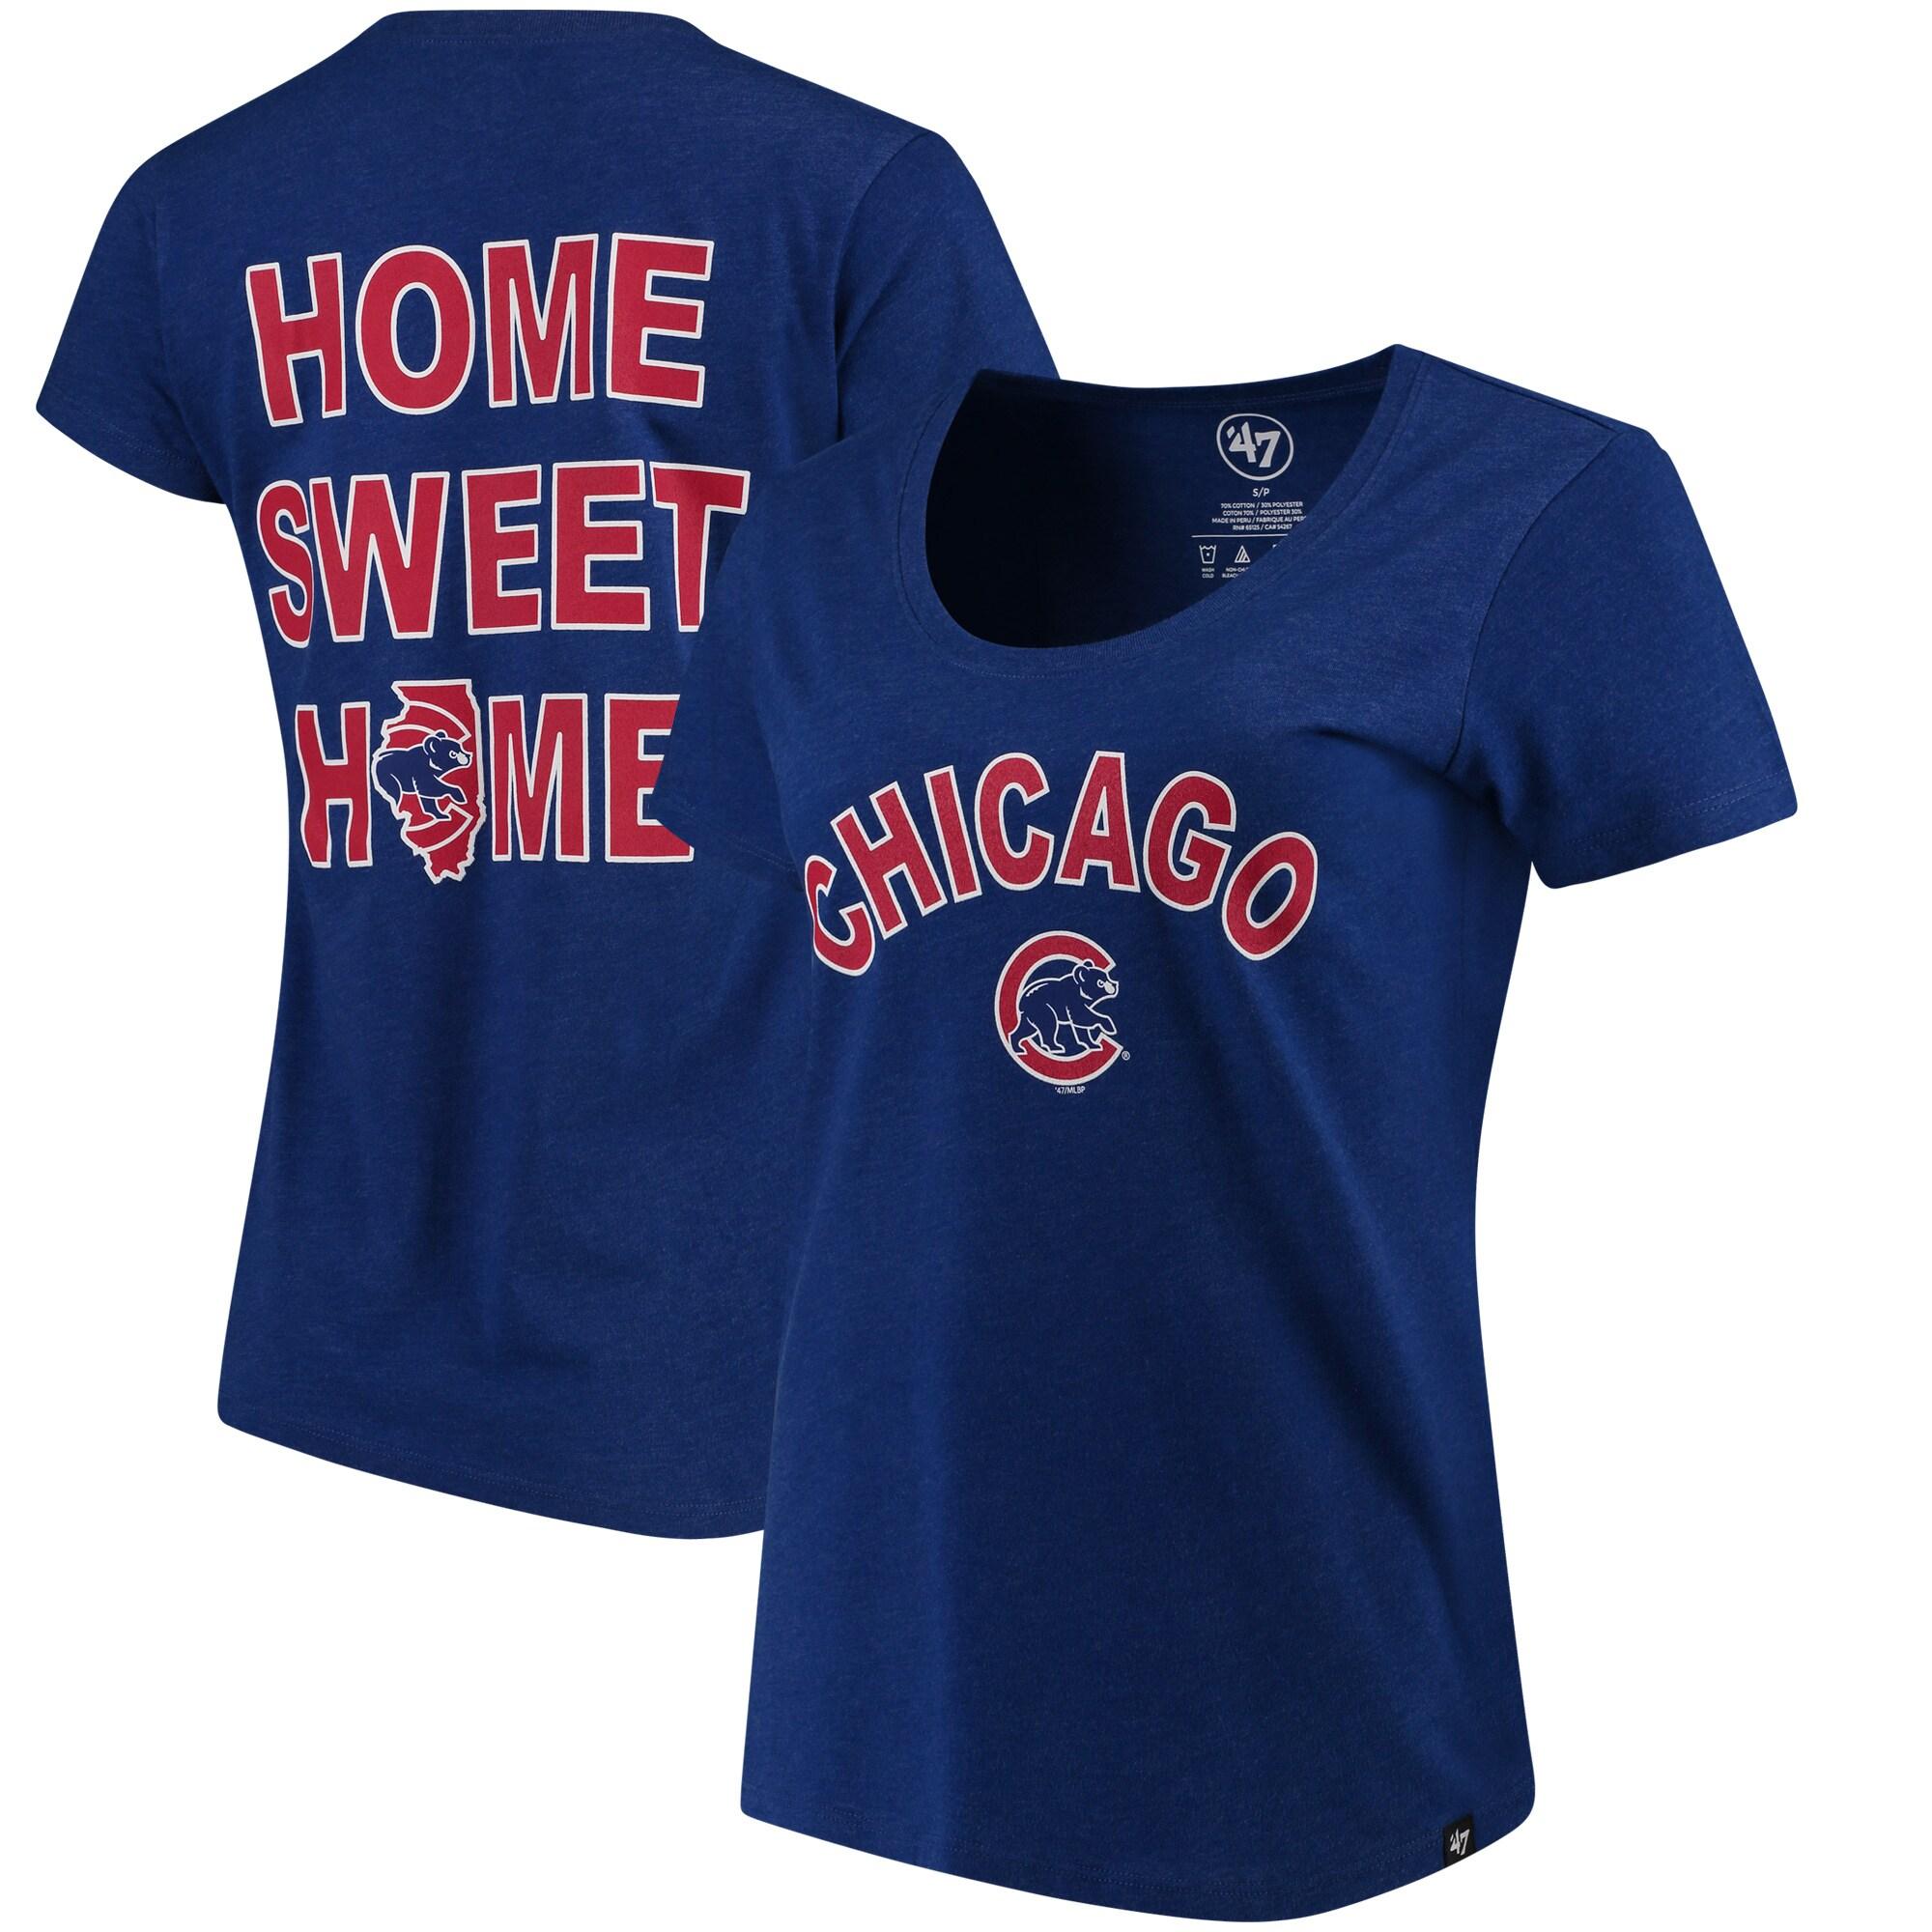 Chicago Cubs '47 Women's Club Scoop Neck T-Shirt - Royal